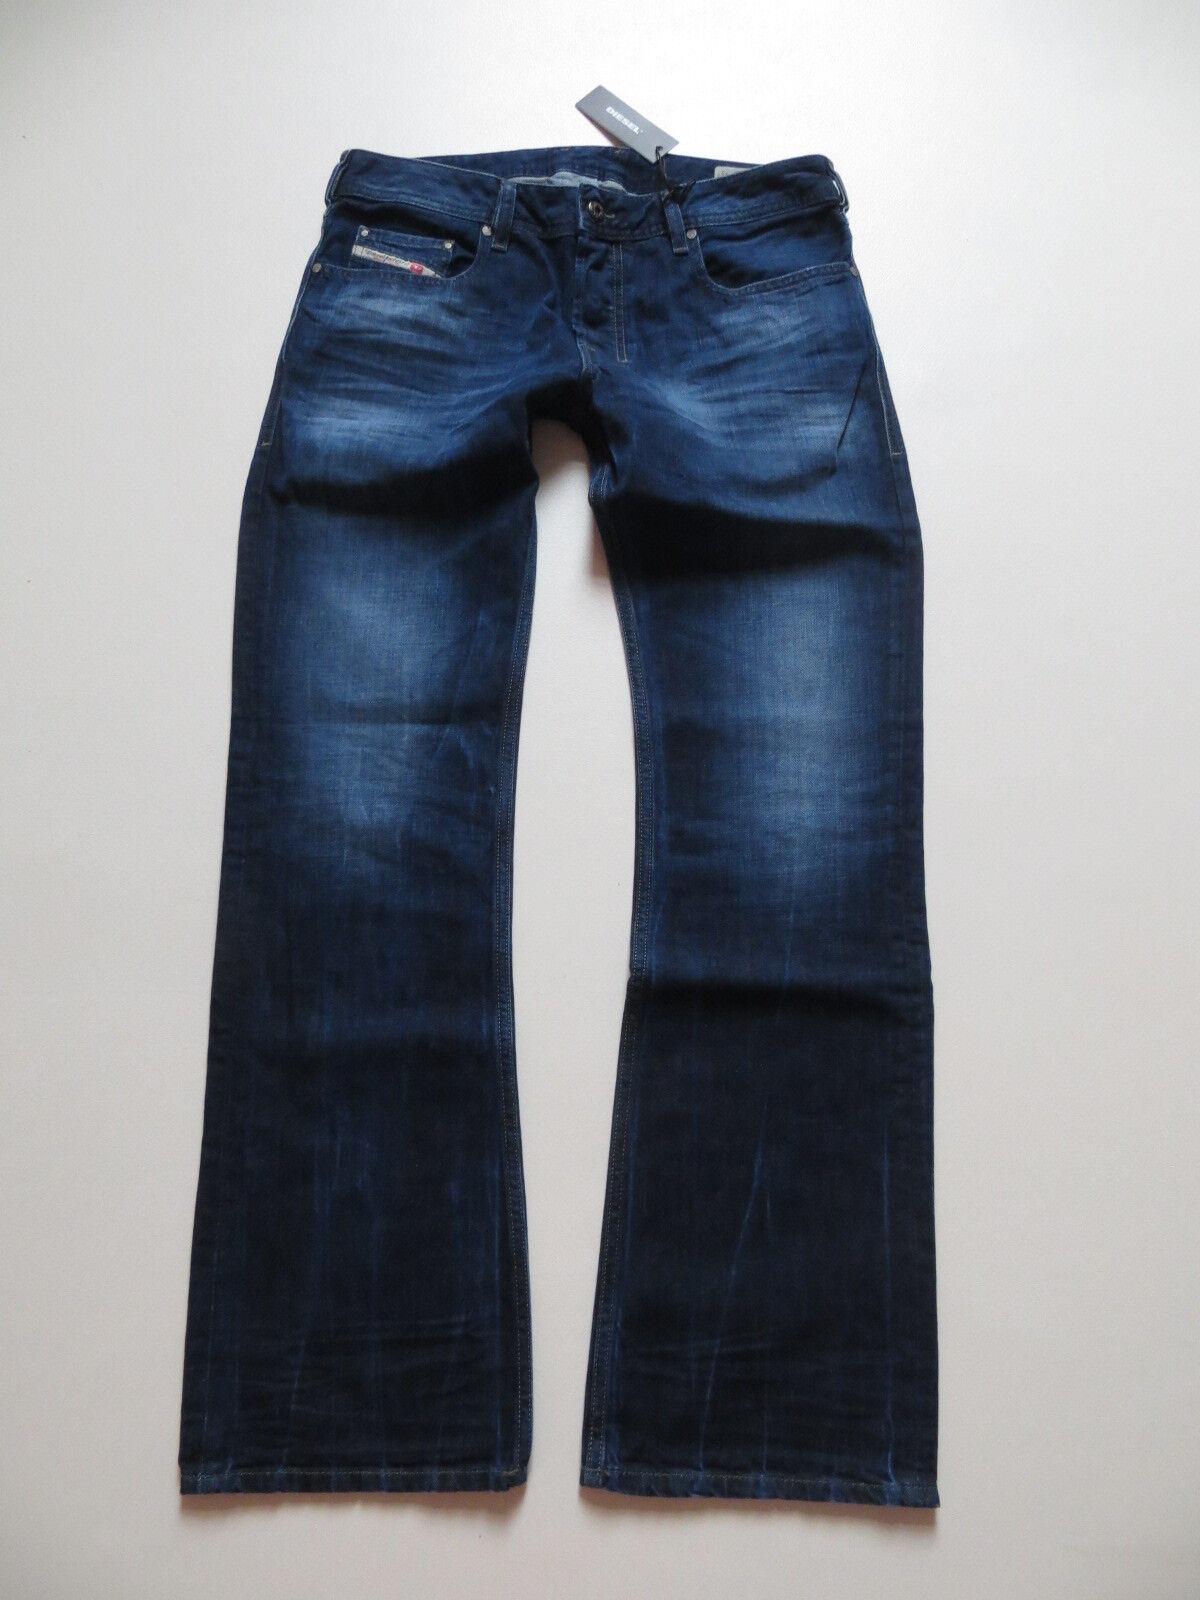 Diesel ZATINY wash R831Q Bootcut Jeans Hose, W 32  L 32, NEU   TOP Waschung   46